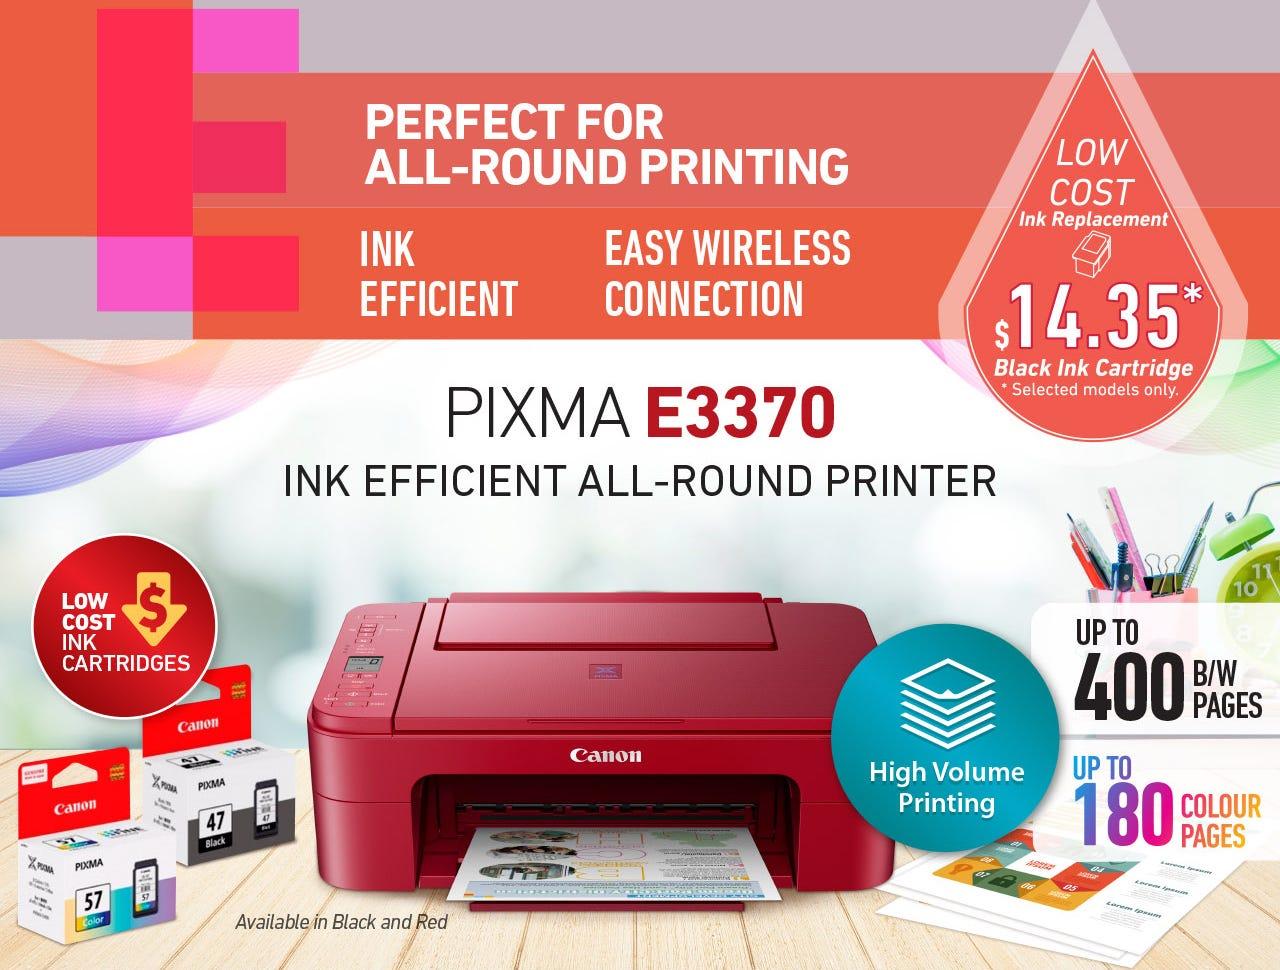 Ink Efficient All-Round Printer - PIXMA E3370